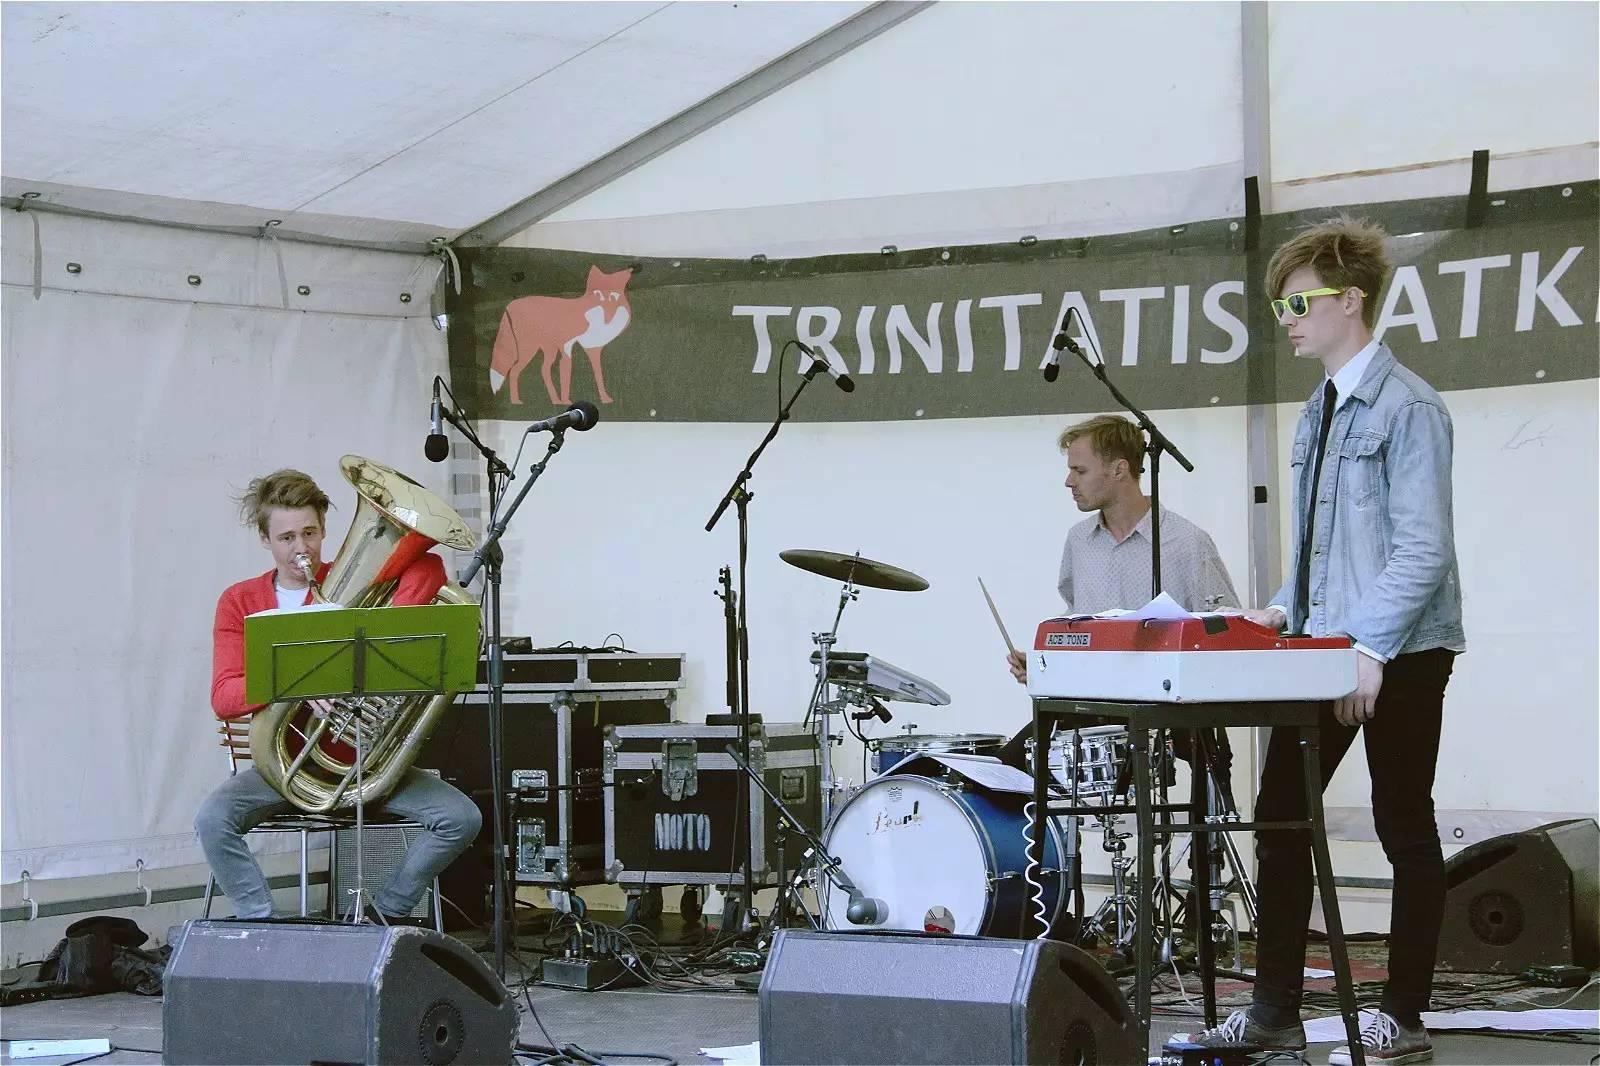 The Roll-Ons @ Trinitatis Natkirke